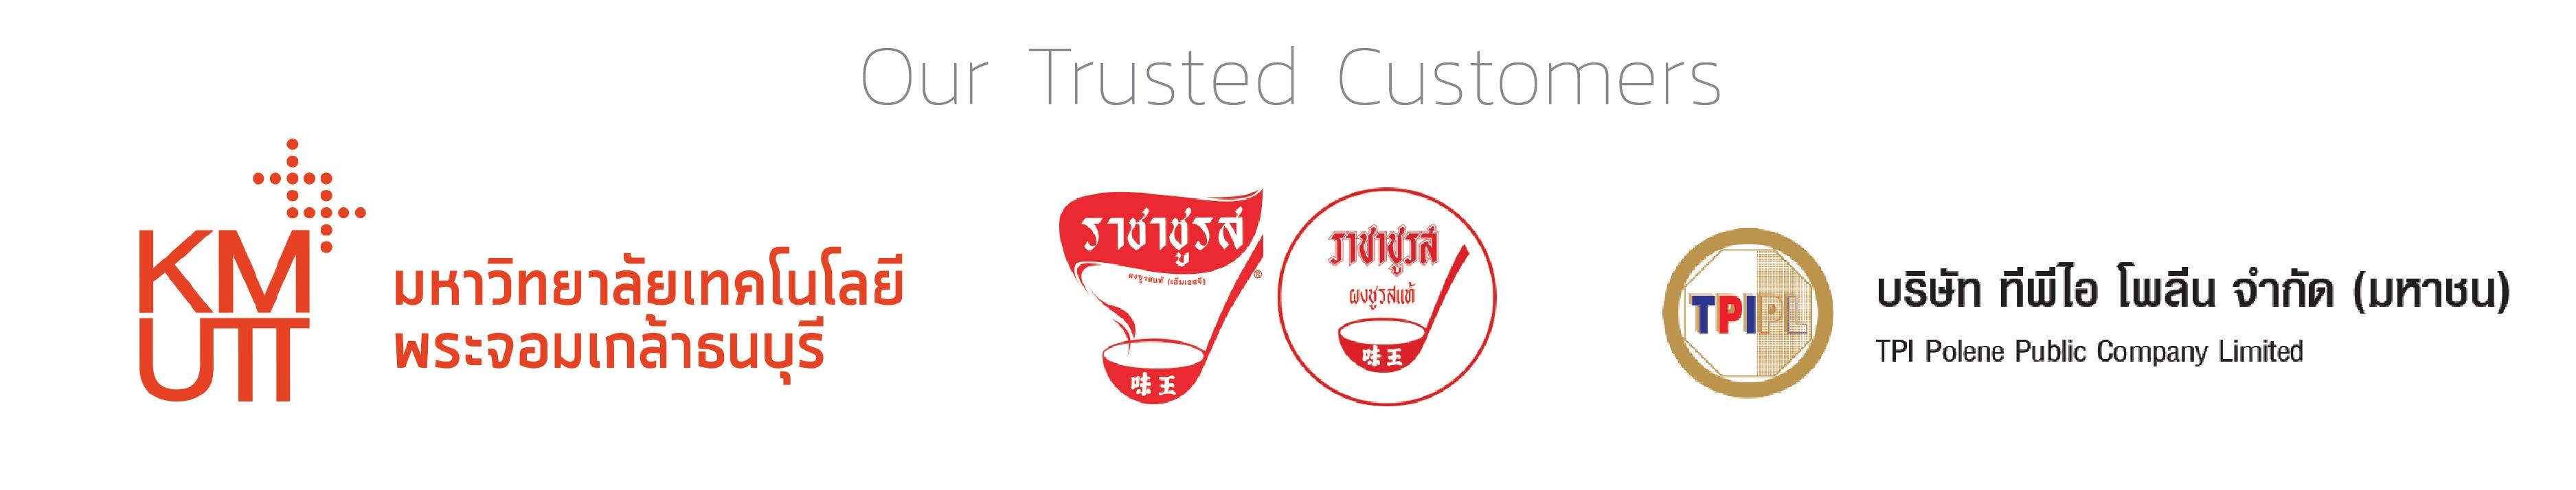 Customers 3